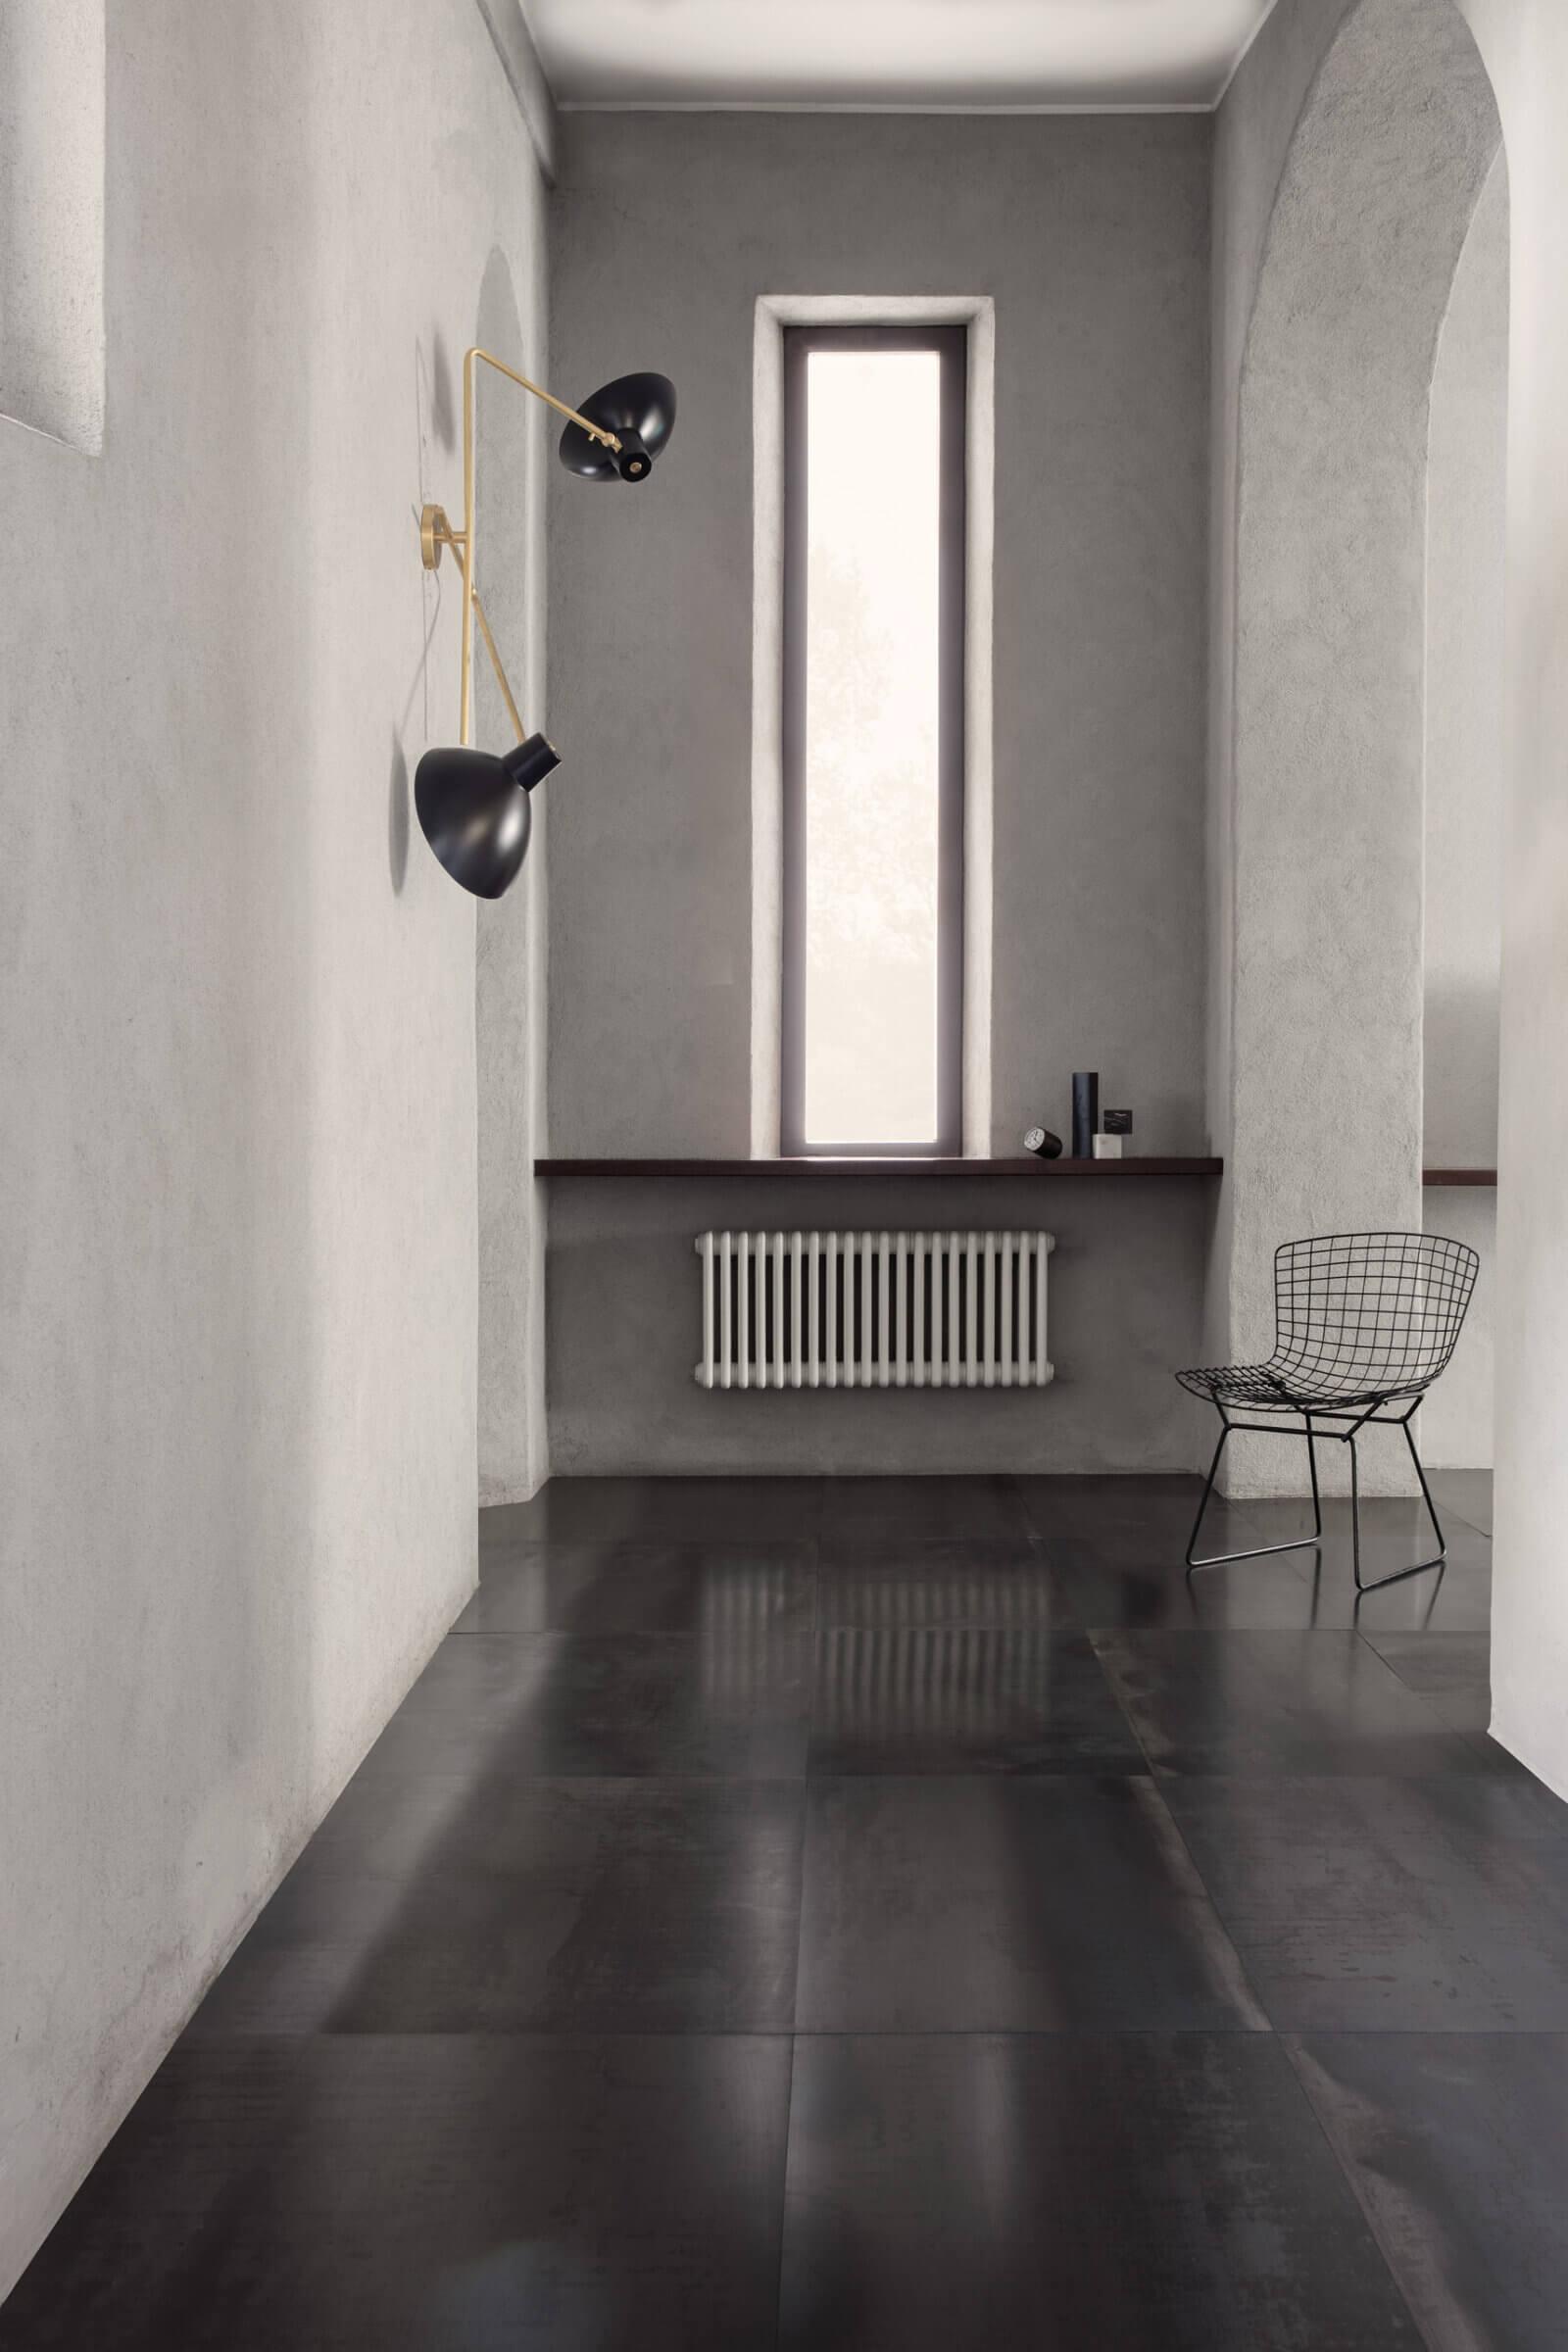 TinnappelMetz-Berlin-Astep-VVCinquanta-Twin-Wall-06